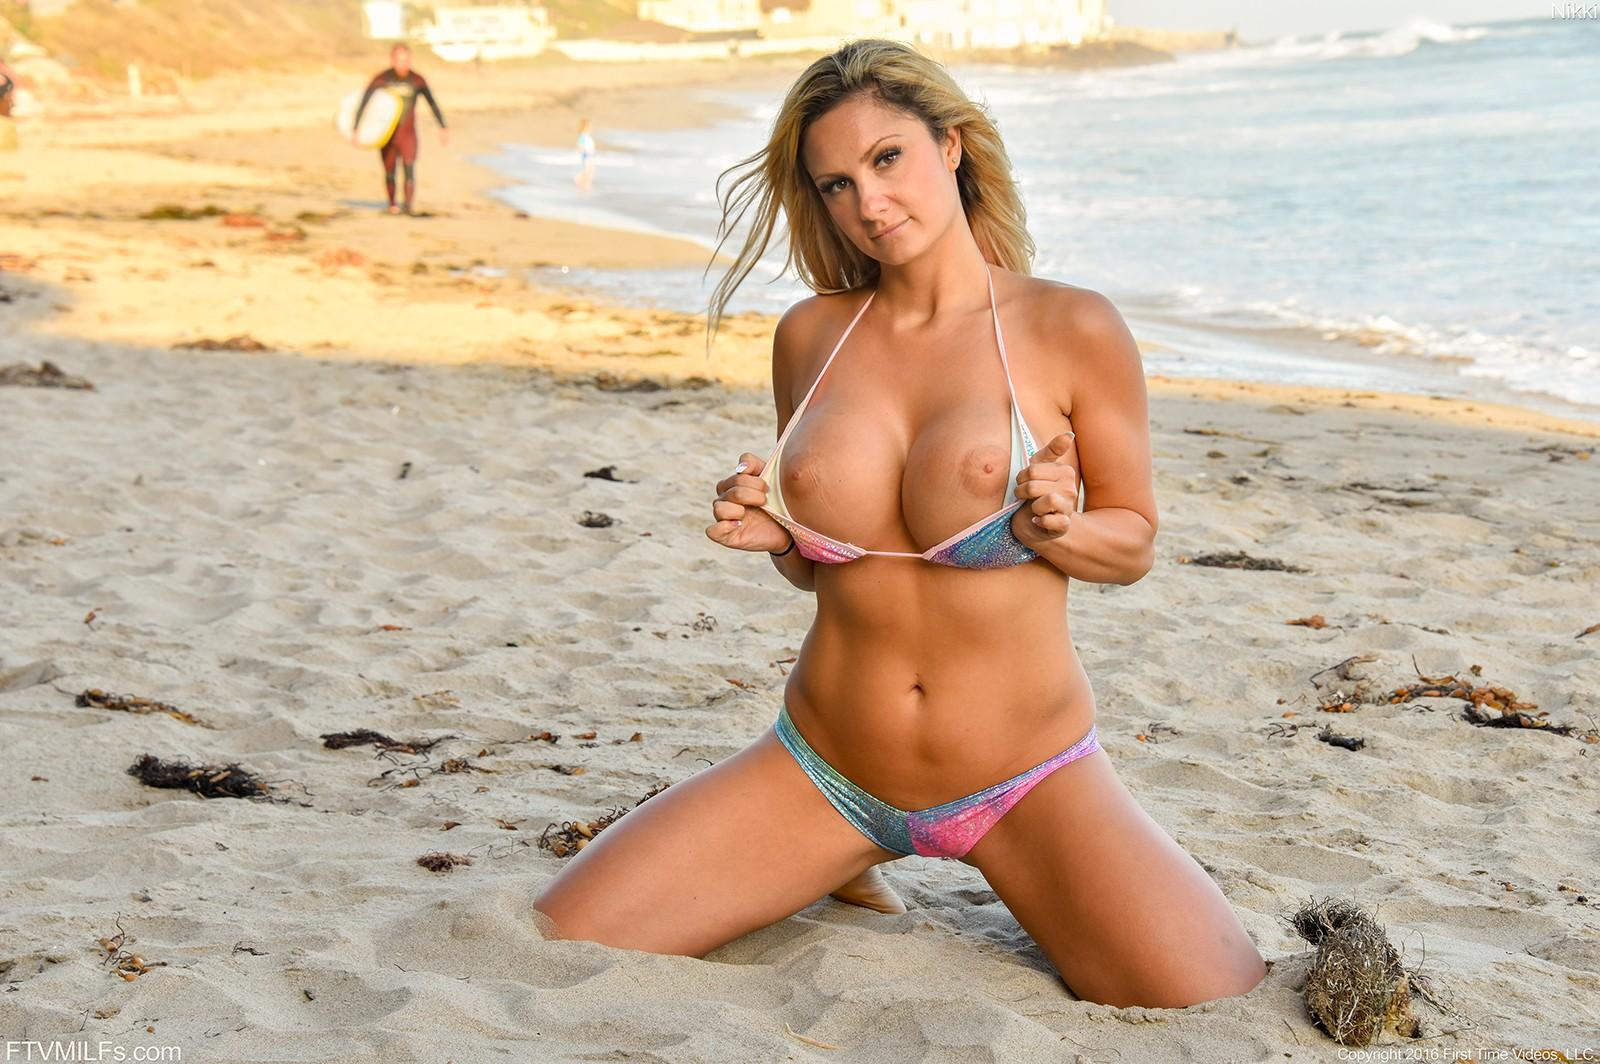 Bikini babe videos